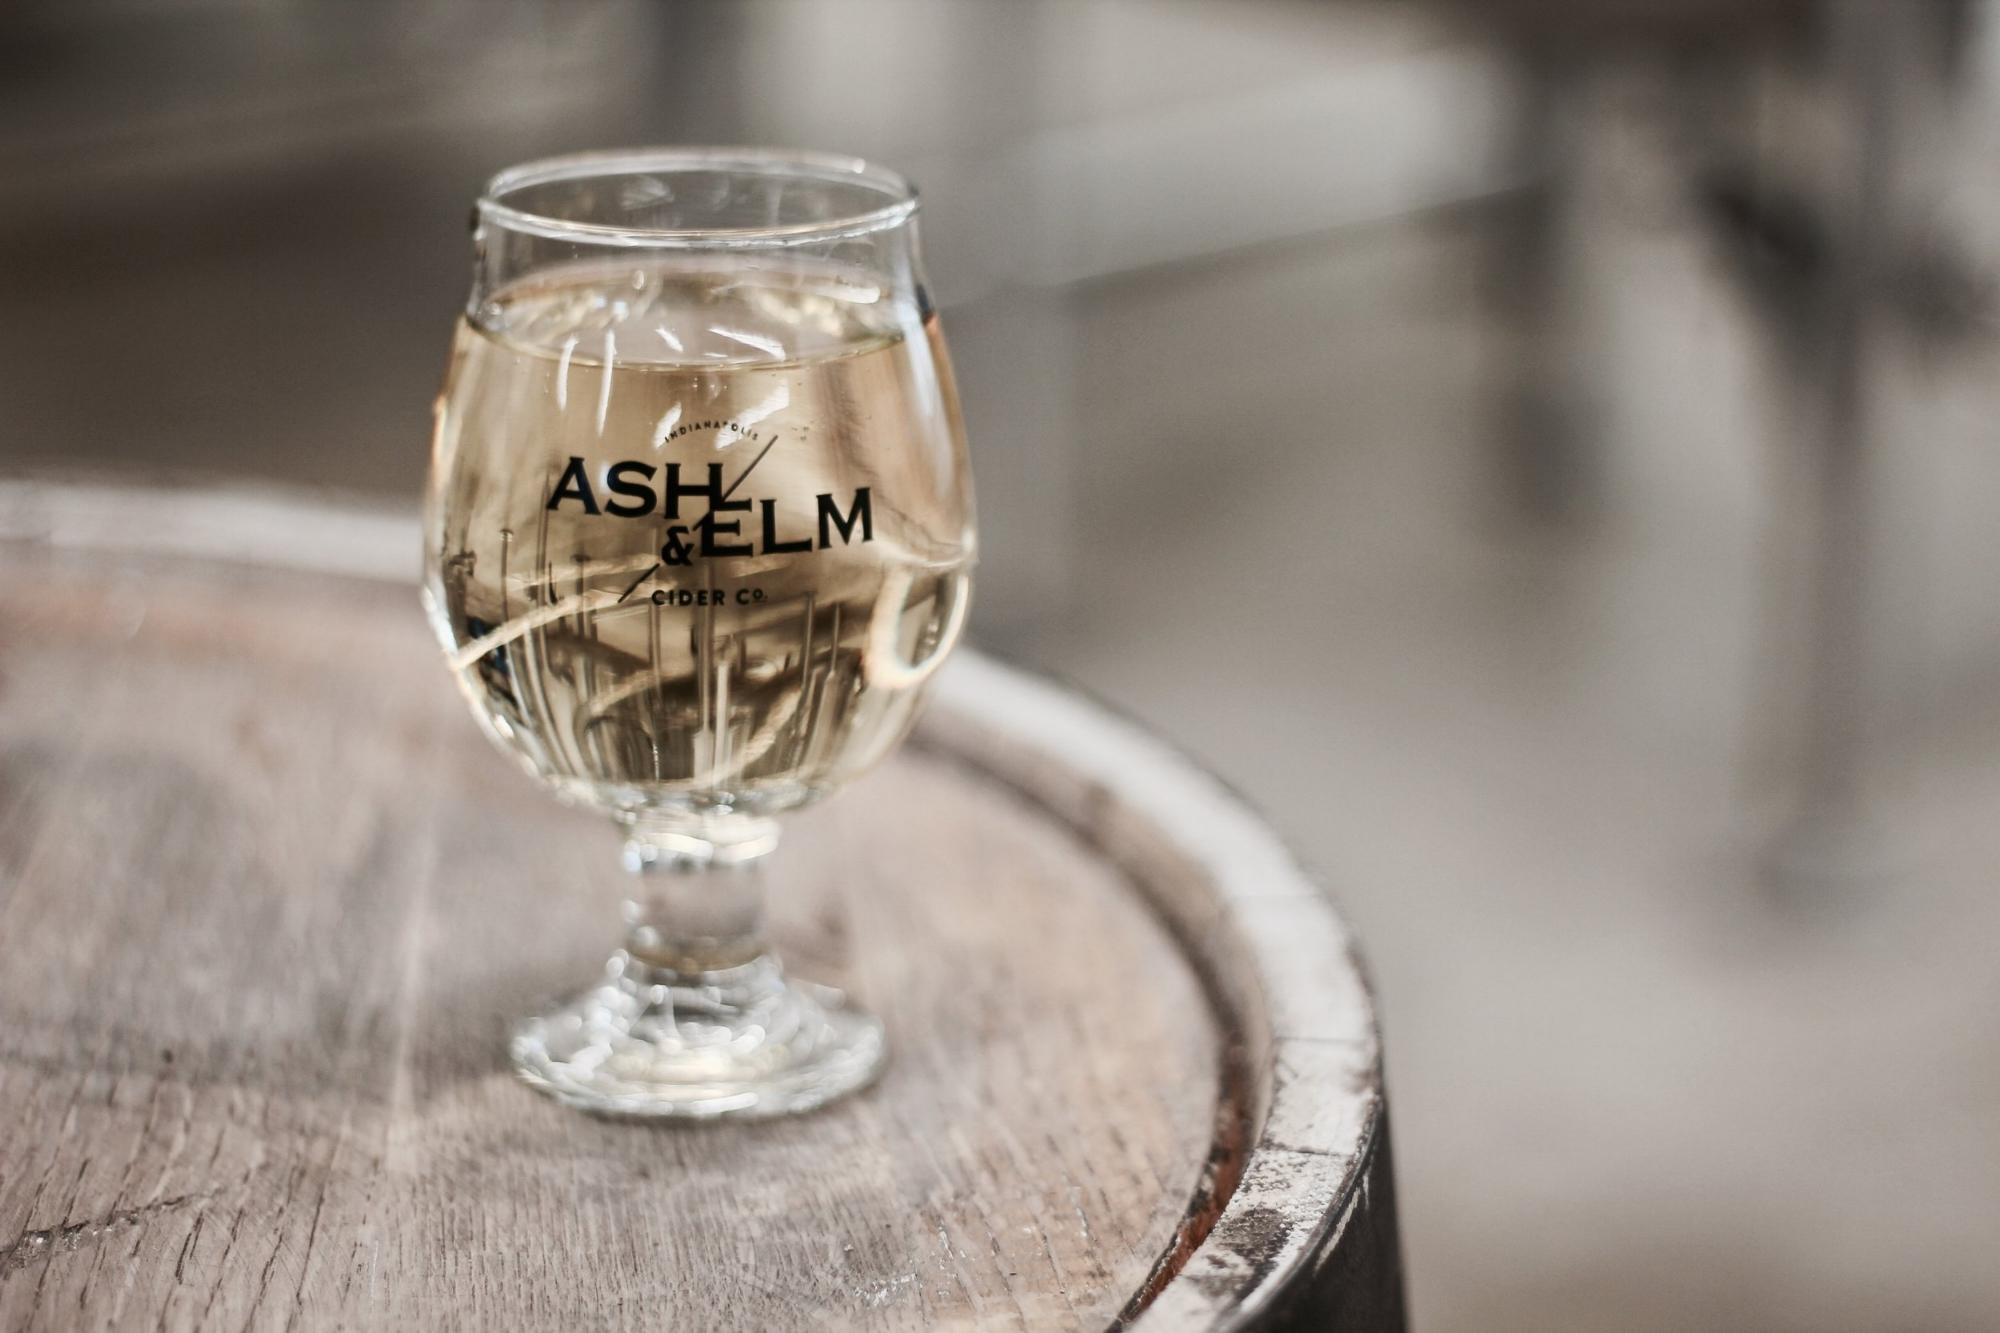 9oz Glass Rum Barrel.jpg